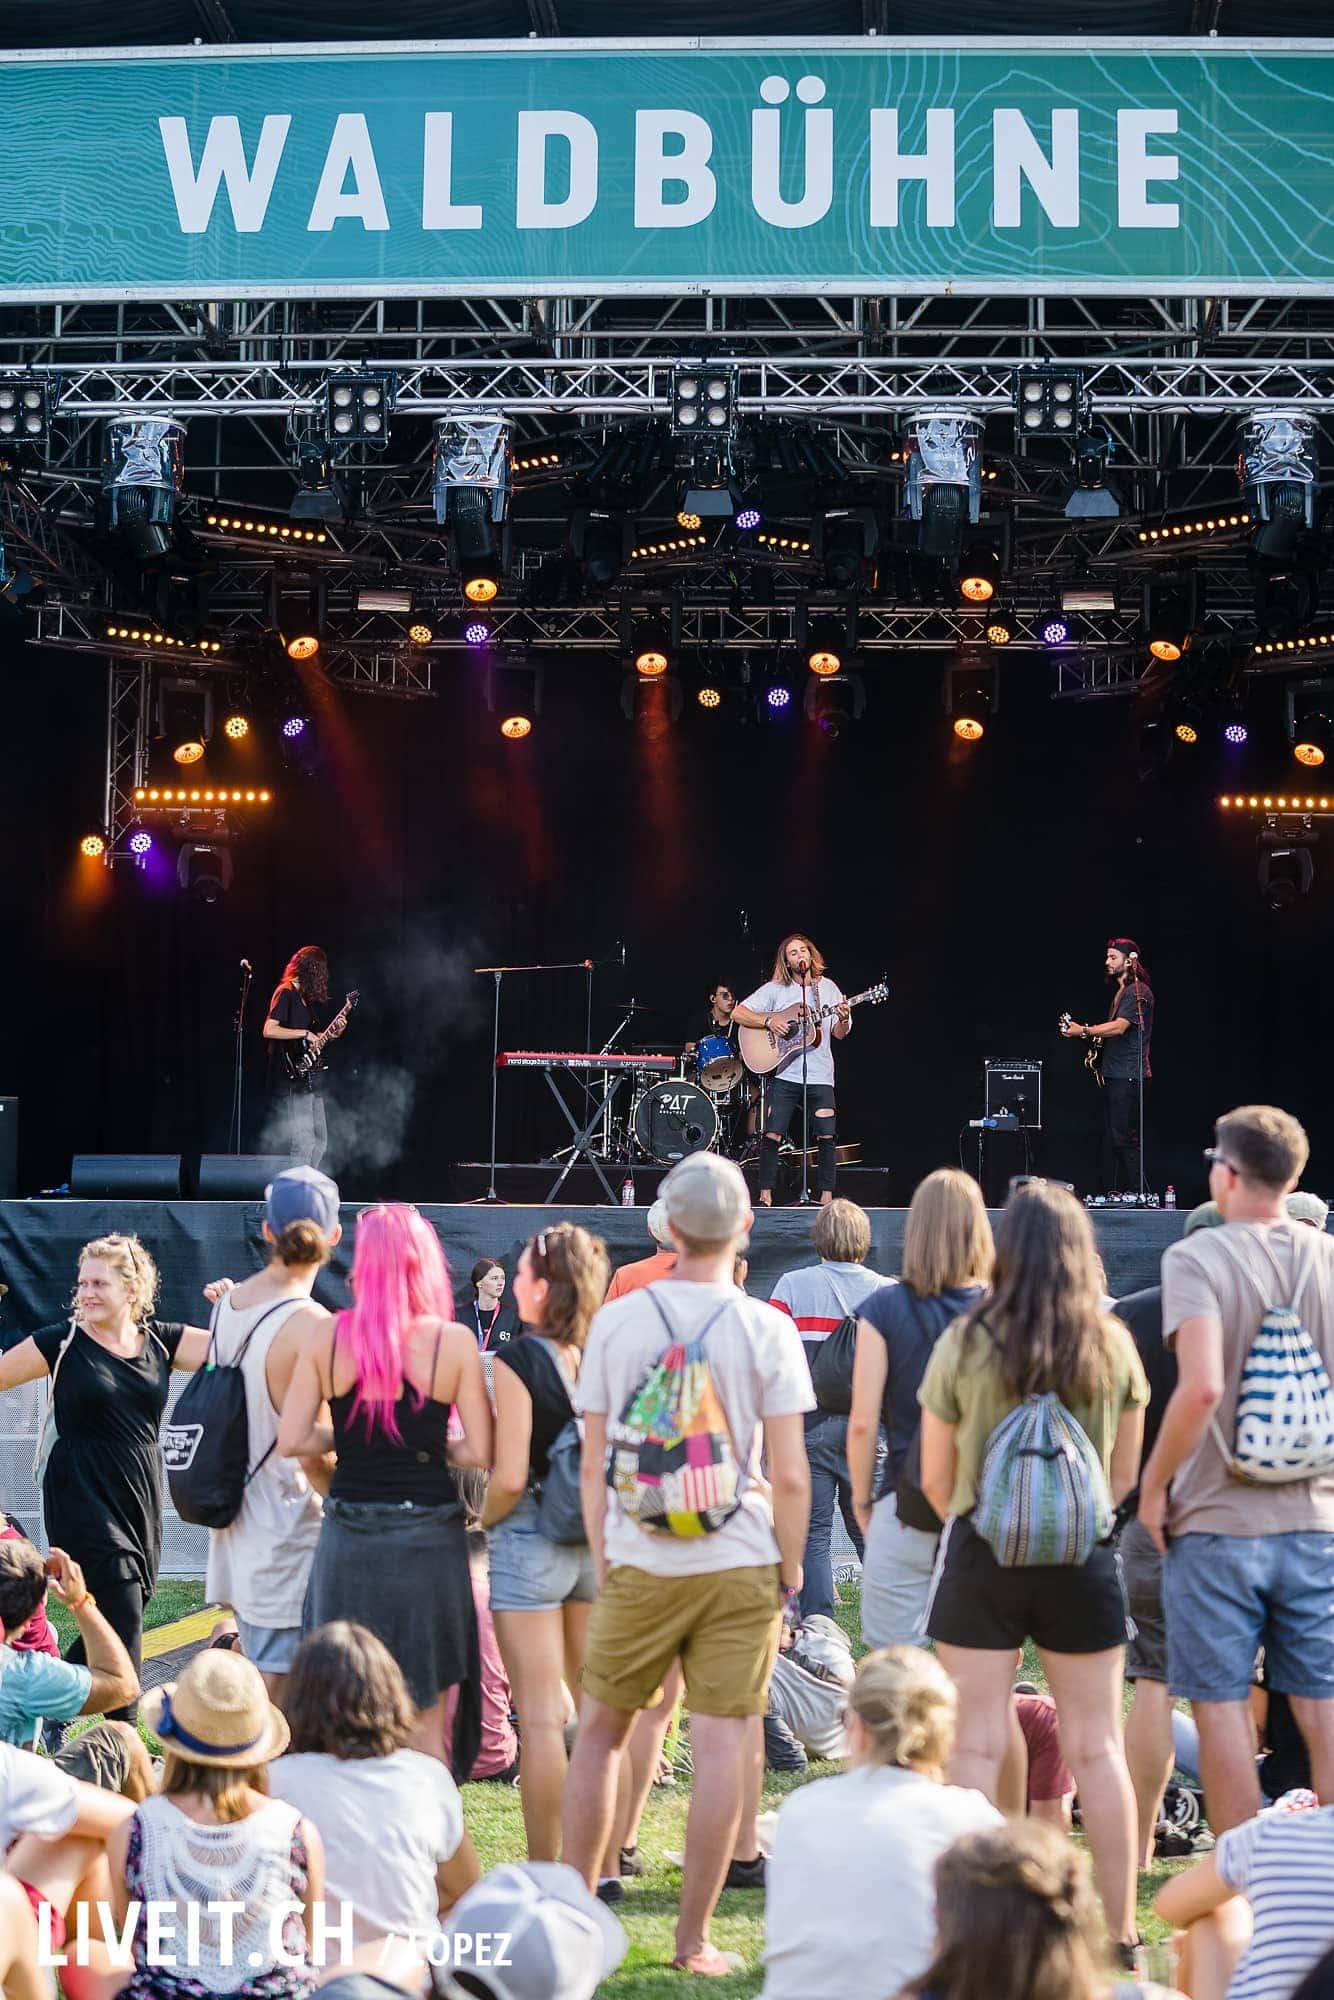 Pat Burgener fotografiert am Gurtenfestival 2018 in Bern. (Manuel Lopez for Gurtenfestival)